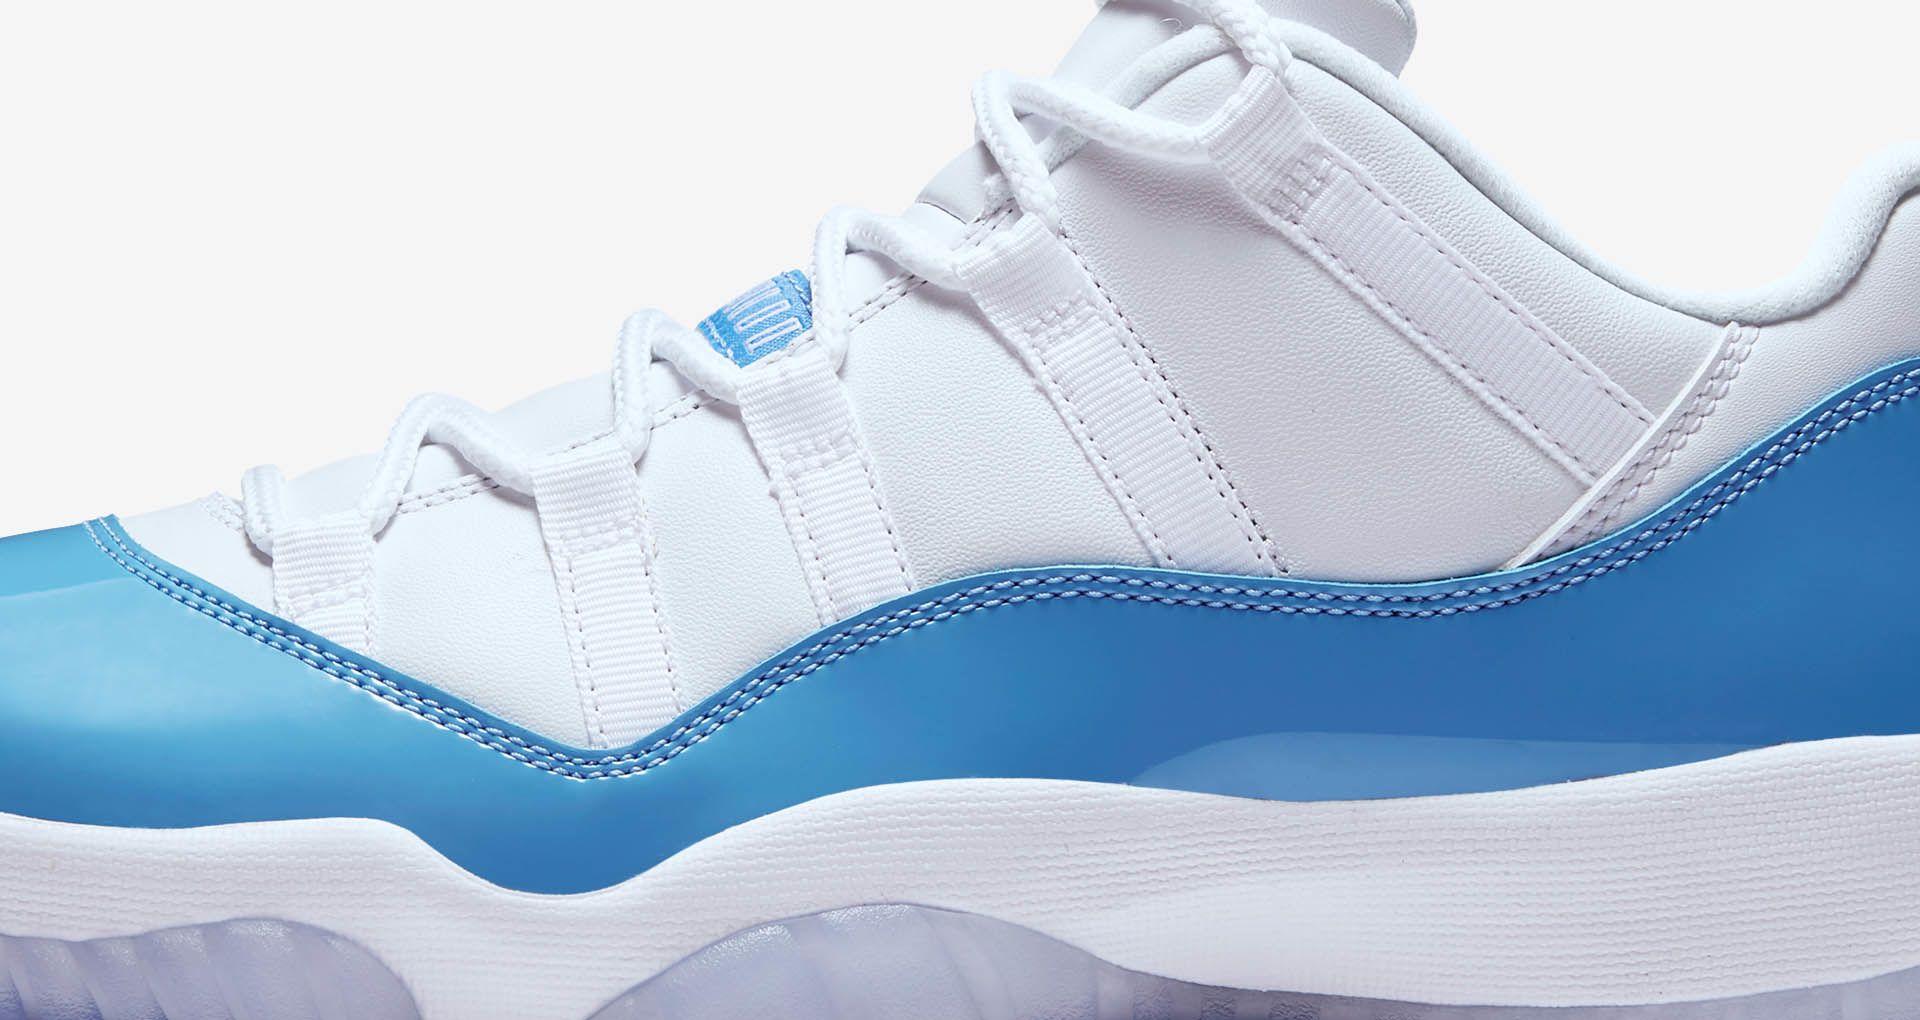 low priced 27552 7aa54 Air Jordan 11 Retro Low  White   University Blue